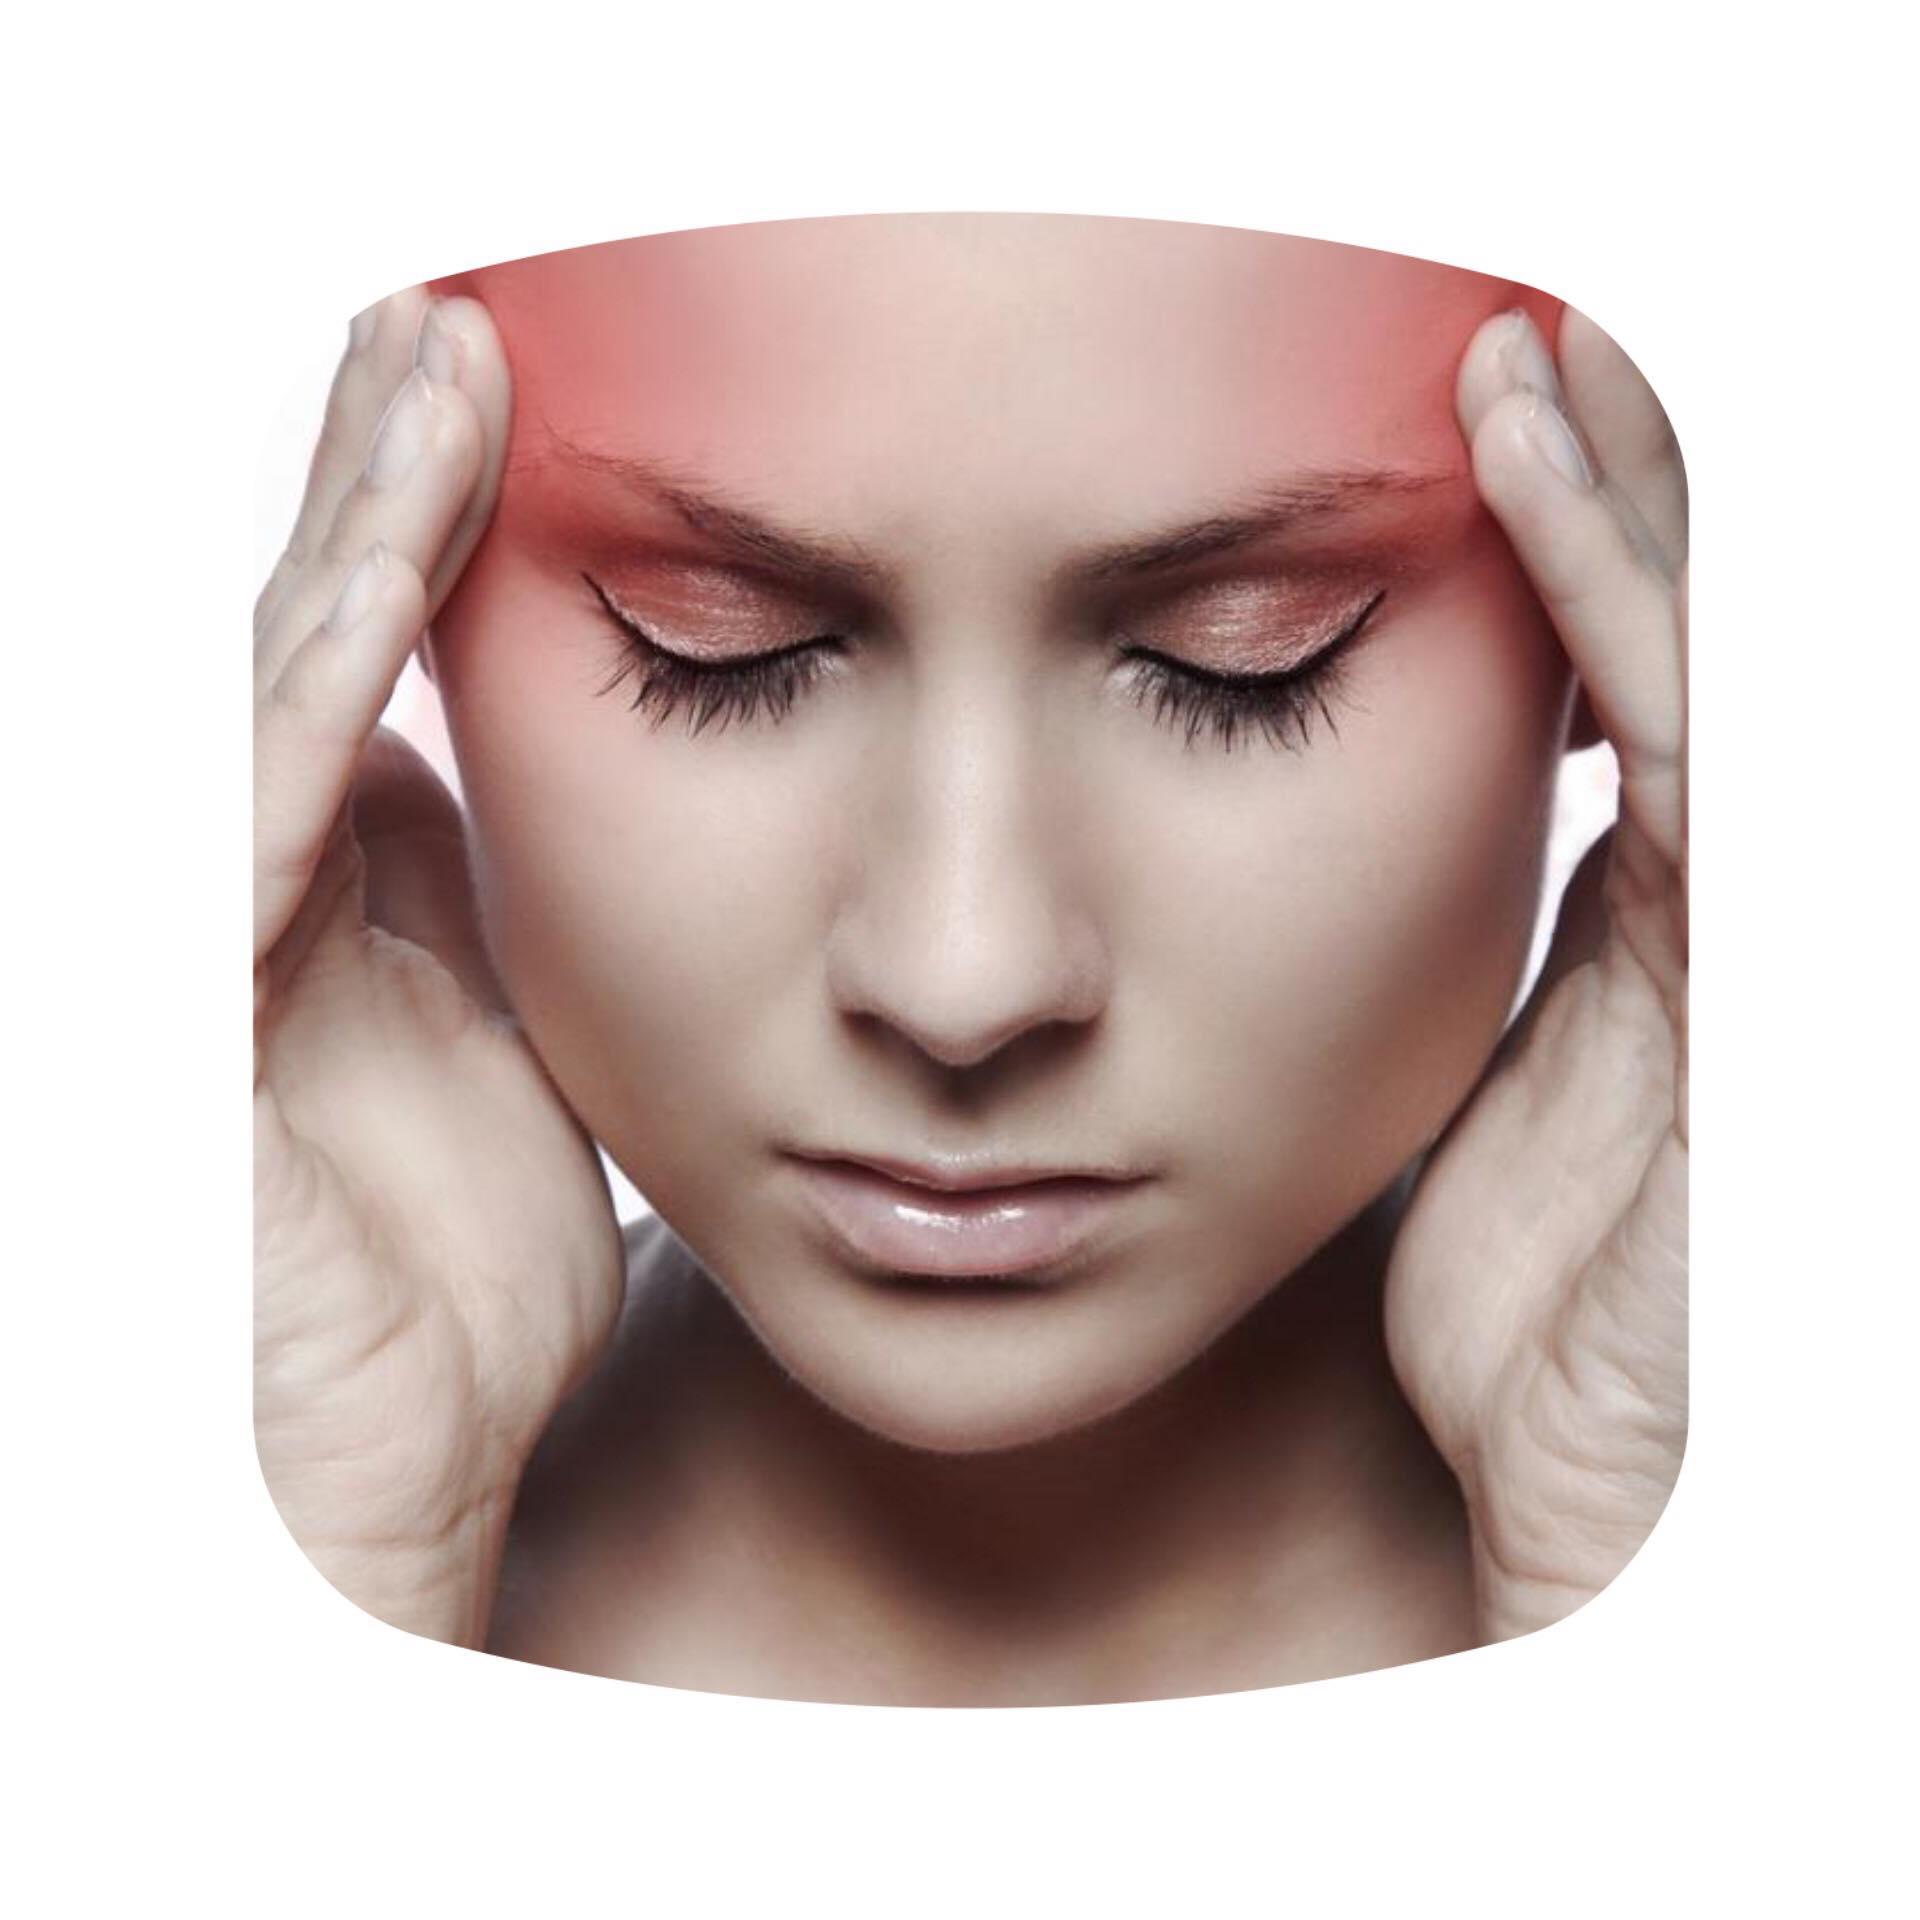 migraine Modere Karinealook